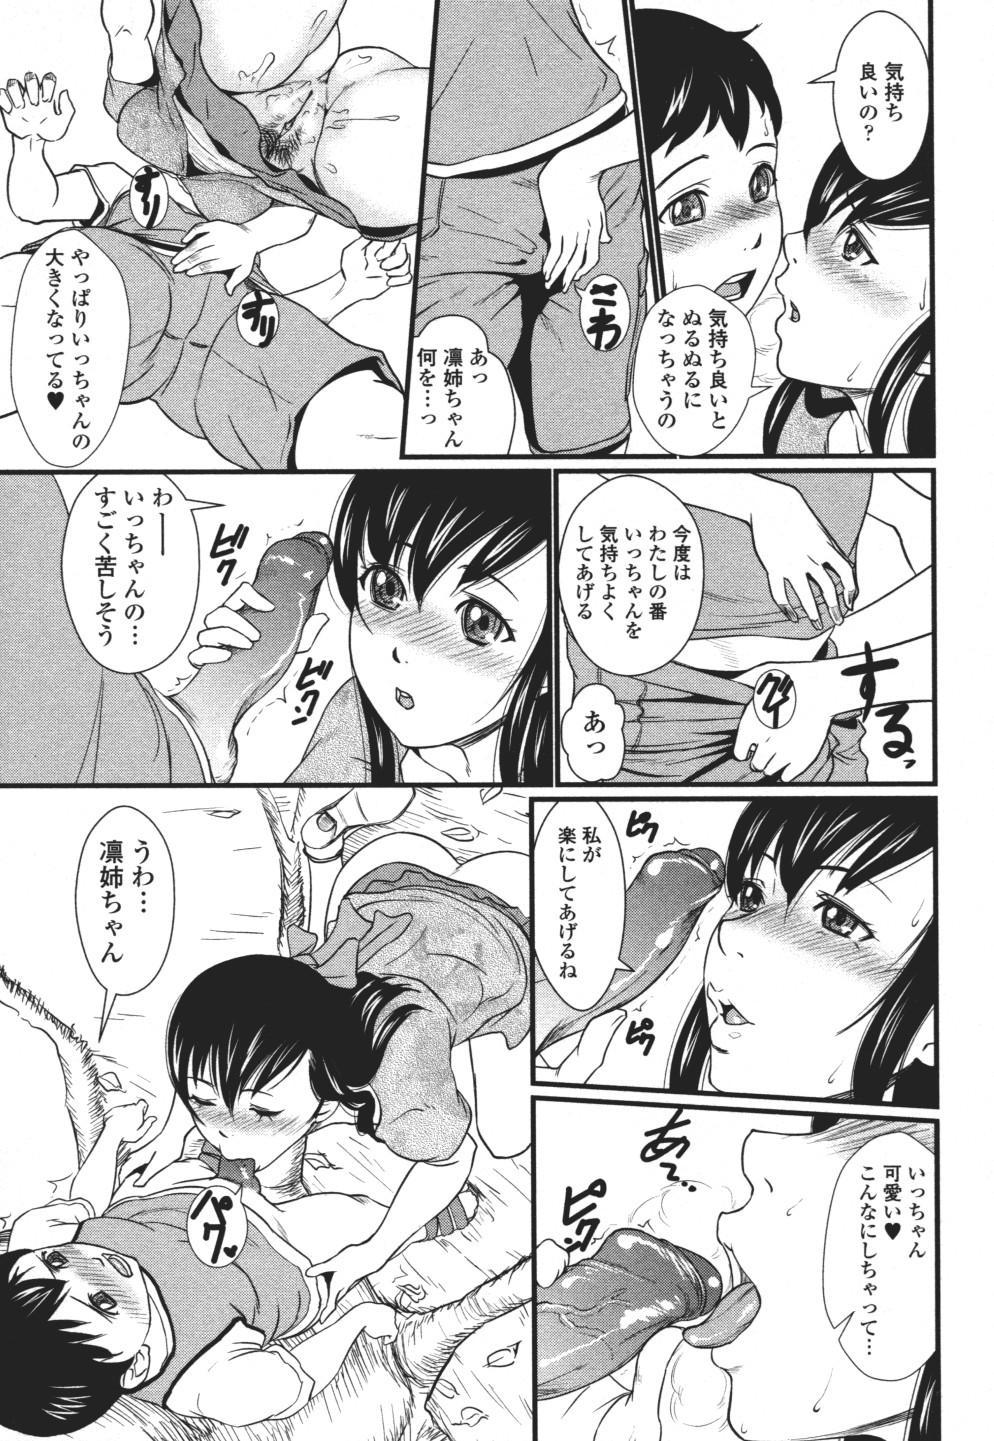 Nozoite wa Ikenai 3 - Do Not Peep! 3 109